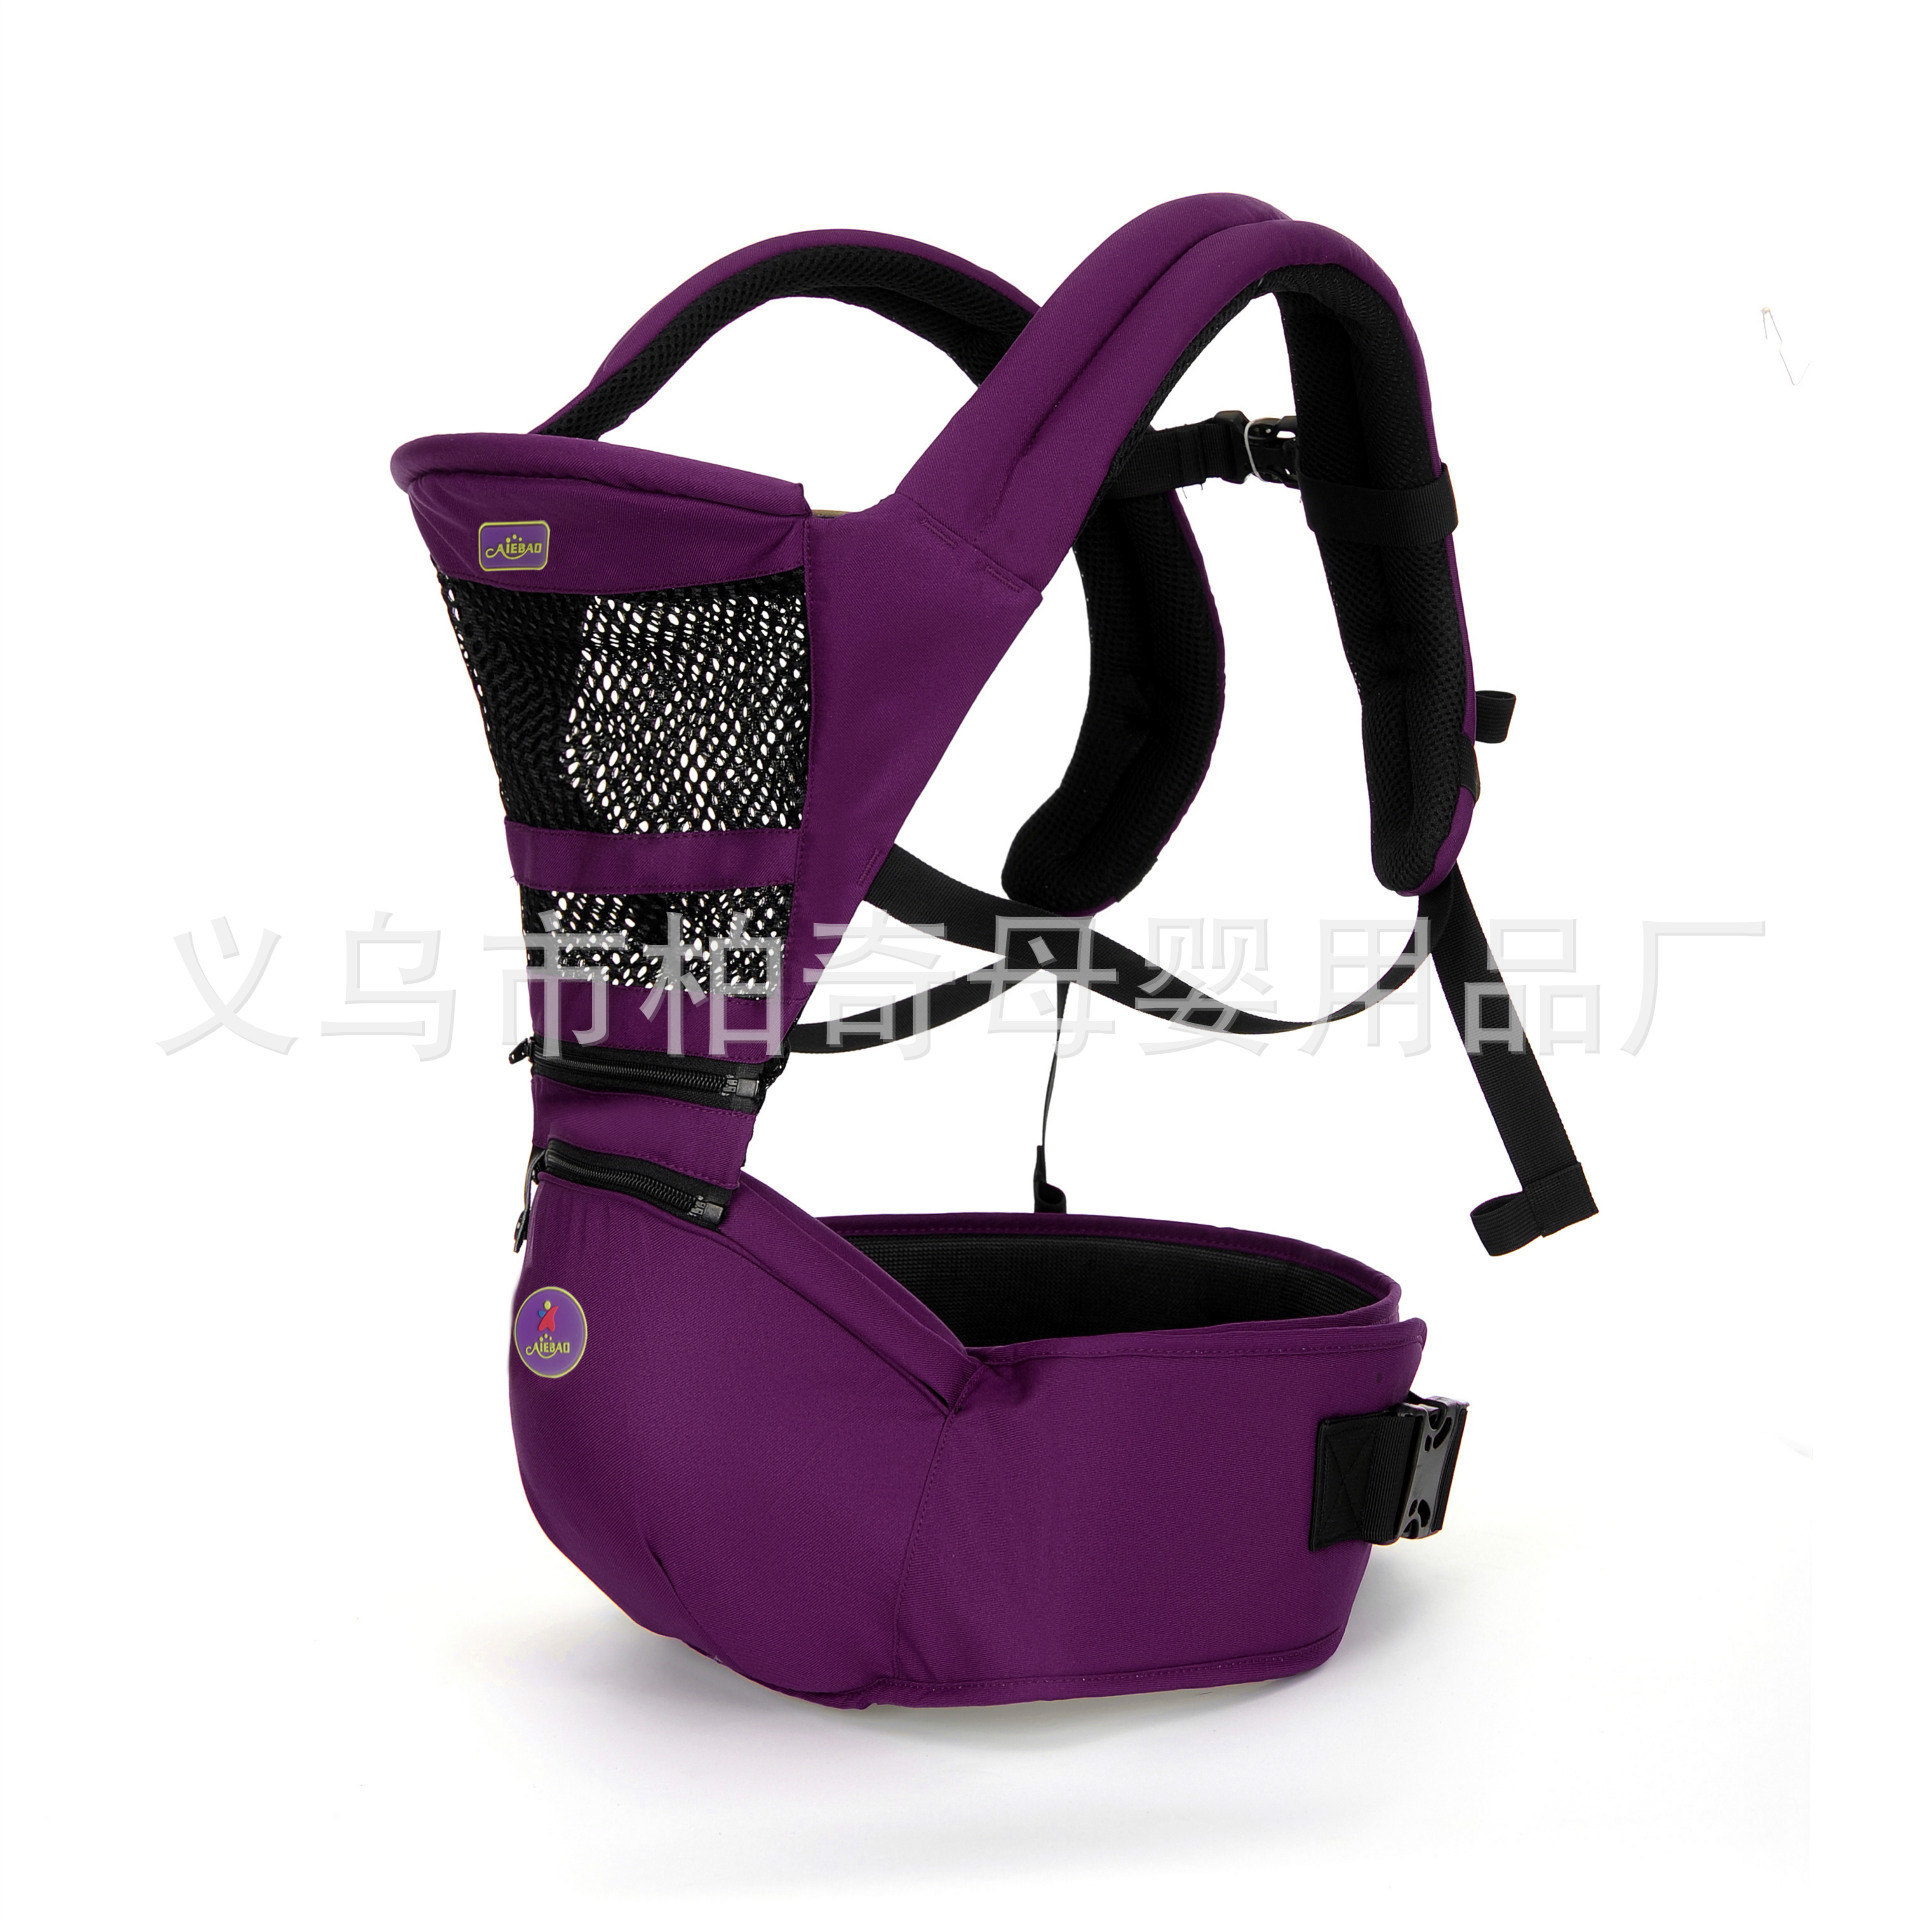 Aiebao 2-24 Months Baby Hipseat Kangaroo Rucksack Mochila Portabebe Ergonomic Baby Carrier Hip Seat Baby Sling Breathable Wrap